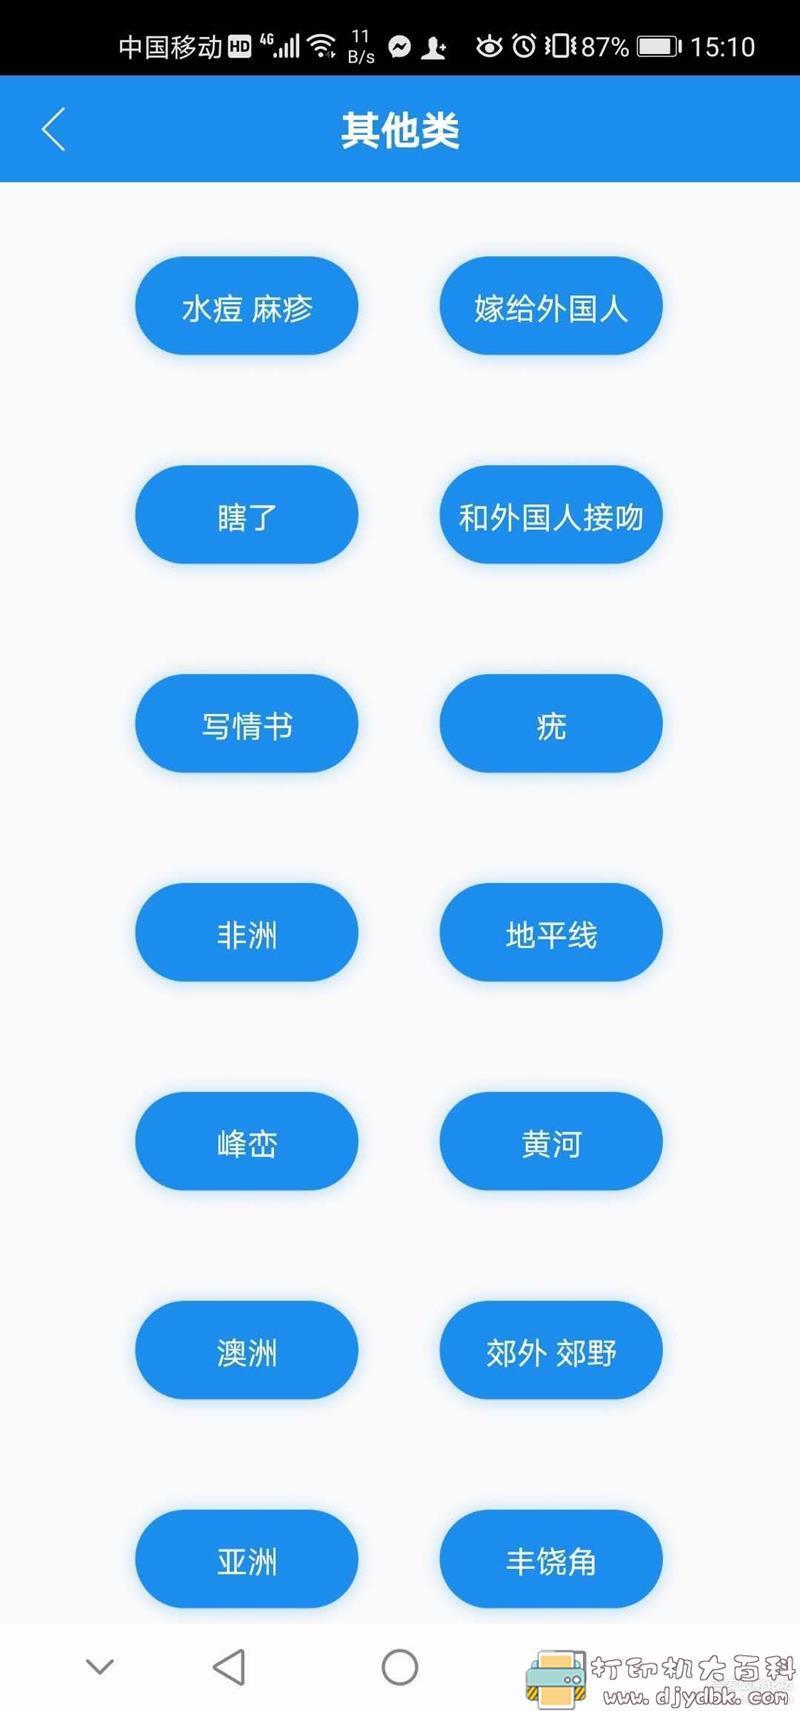 [Android]【周公解梦app】解梦预测图片 No.2